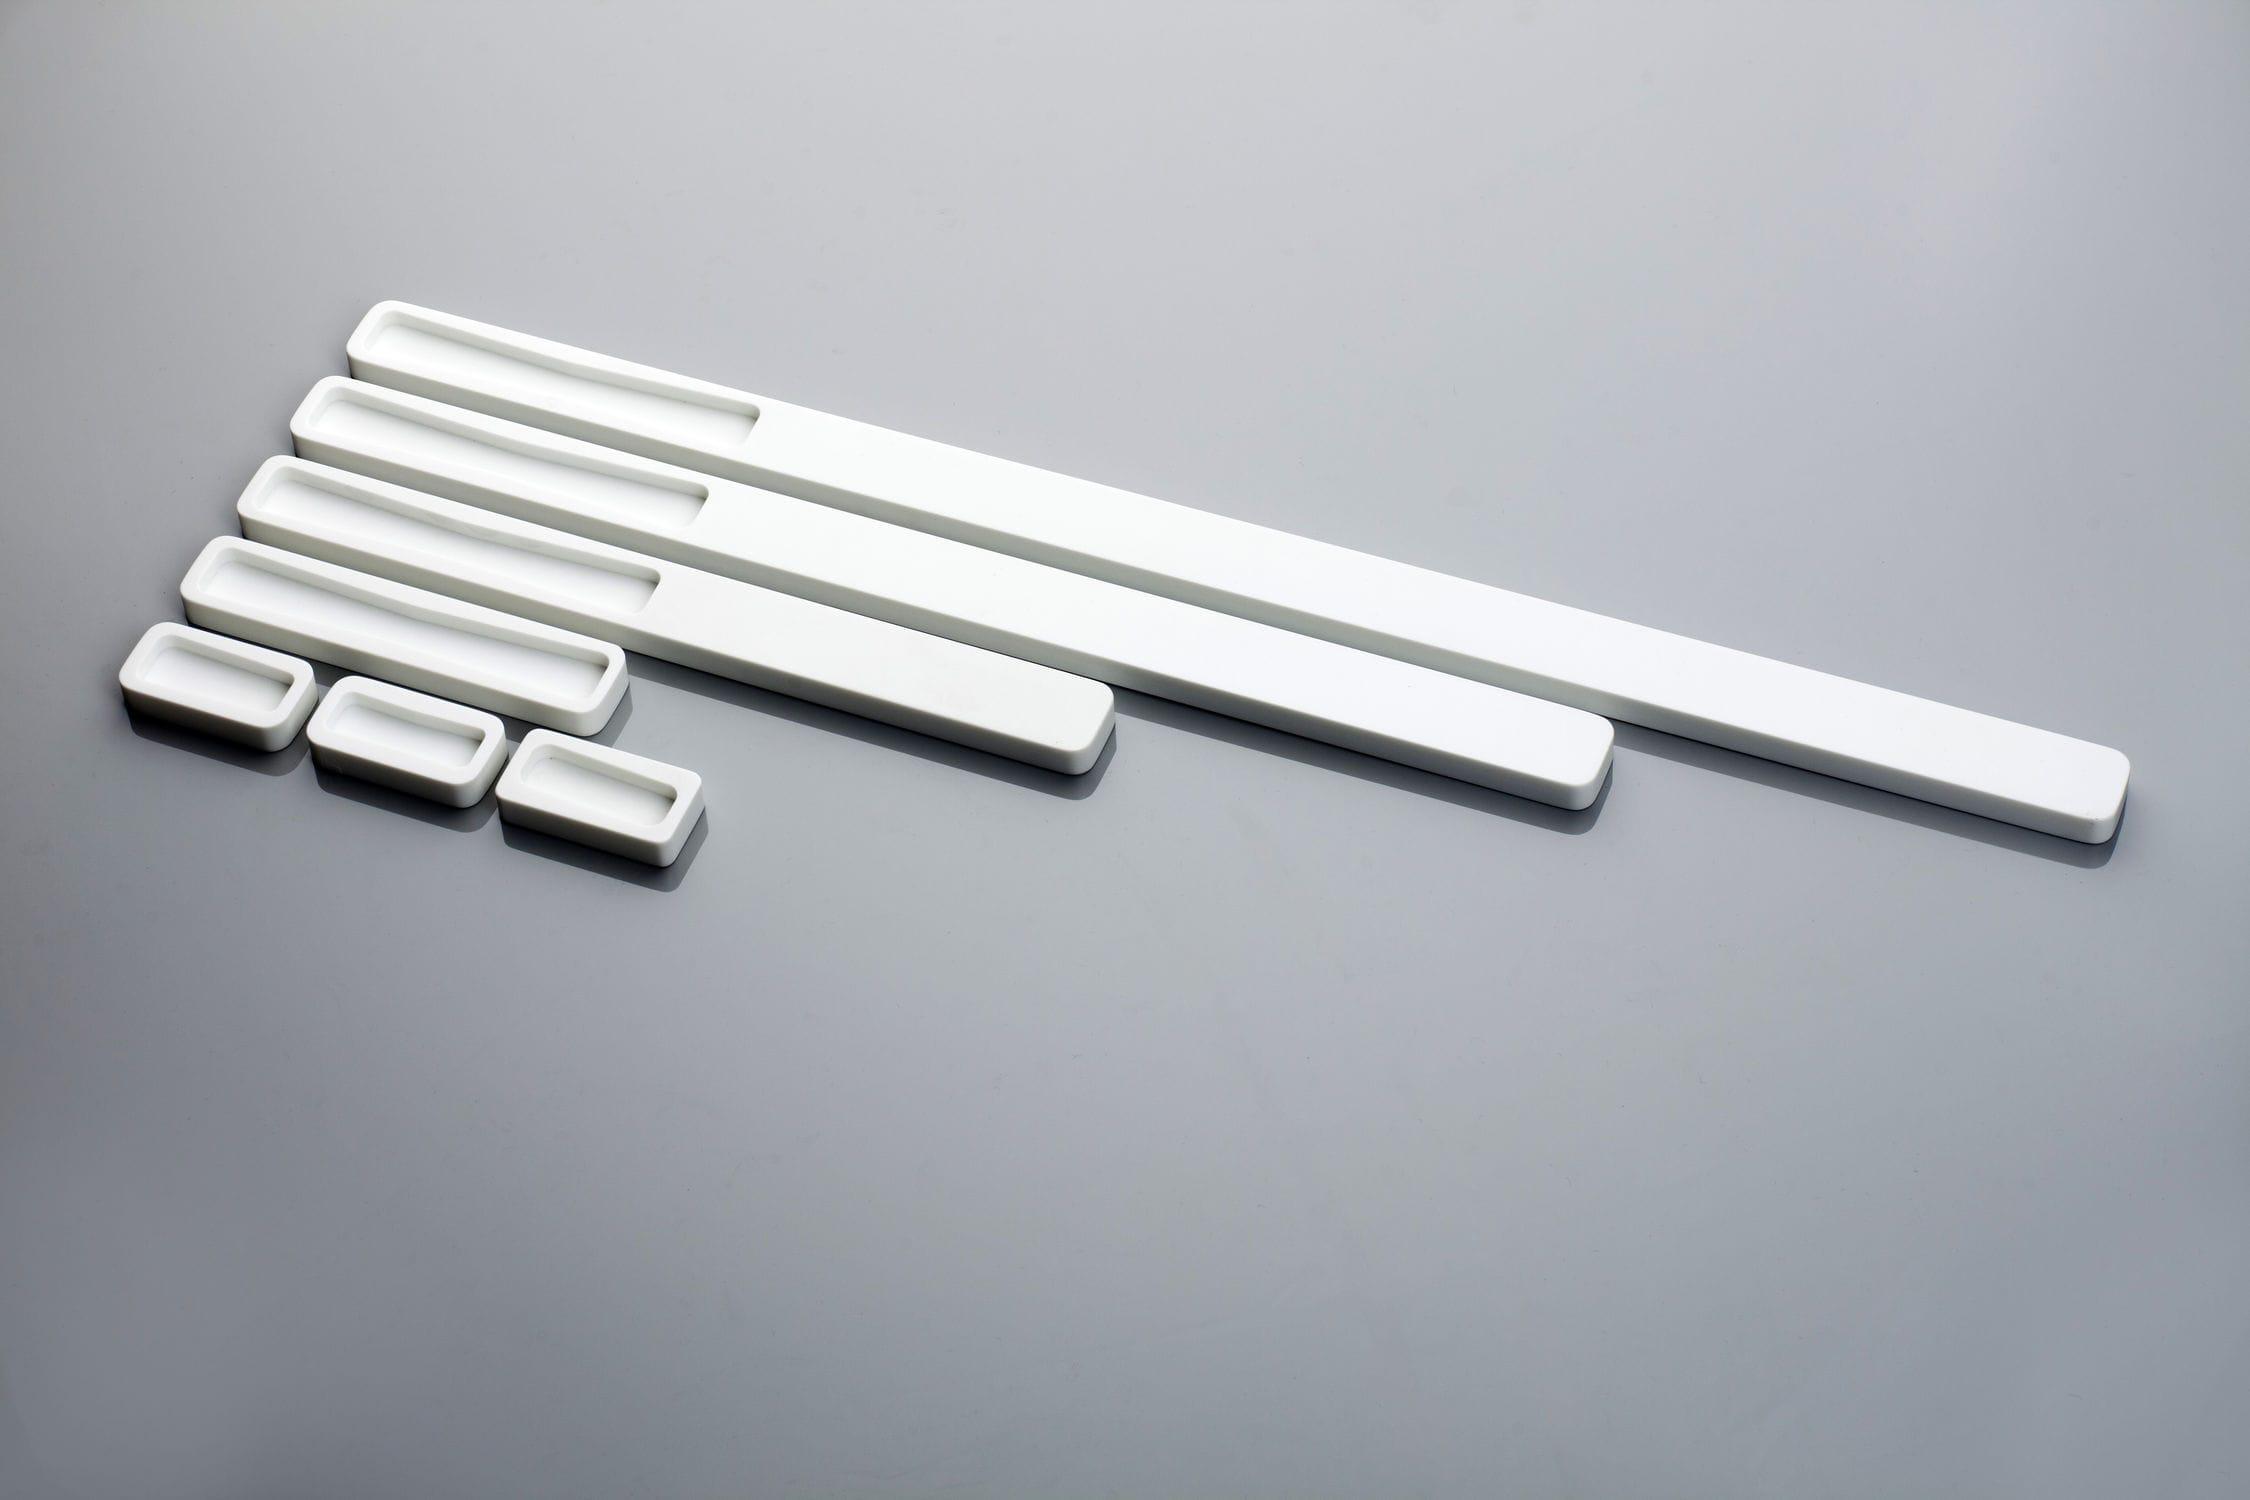 poignée de meuble en corian® - linie 2 by vladimír ambroz - amos ... - Poignee Meuble Design